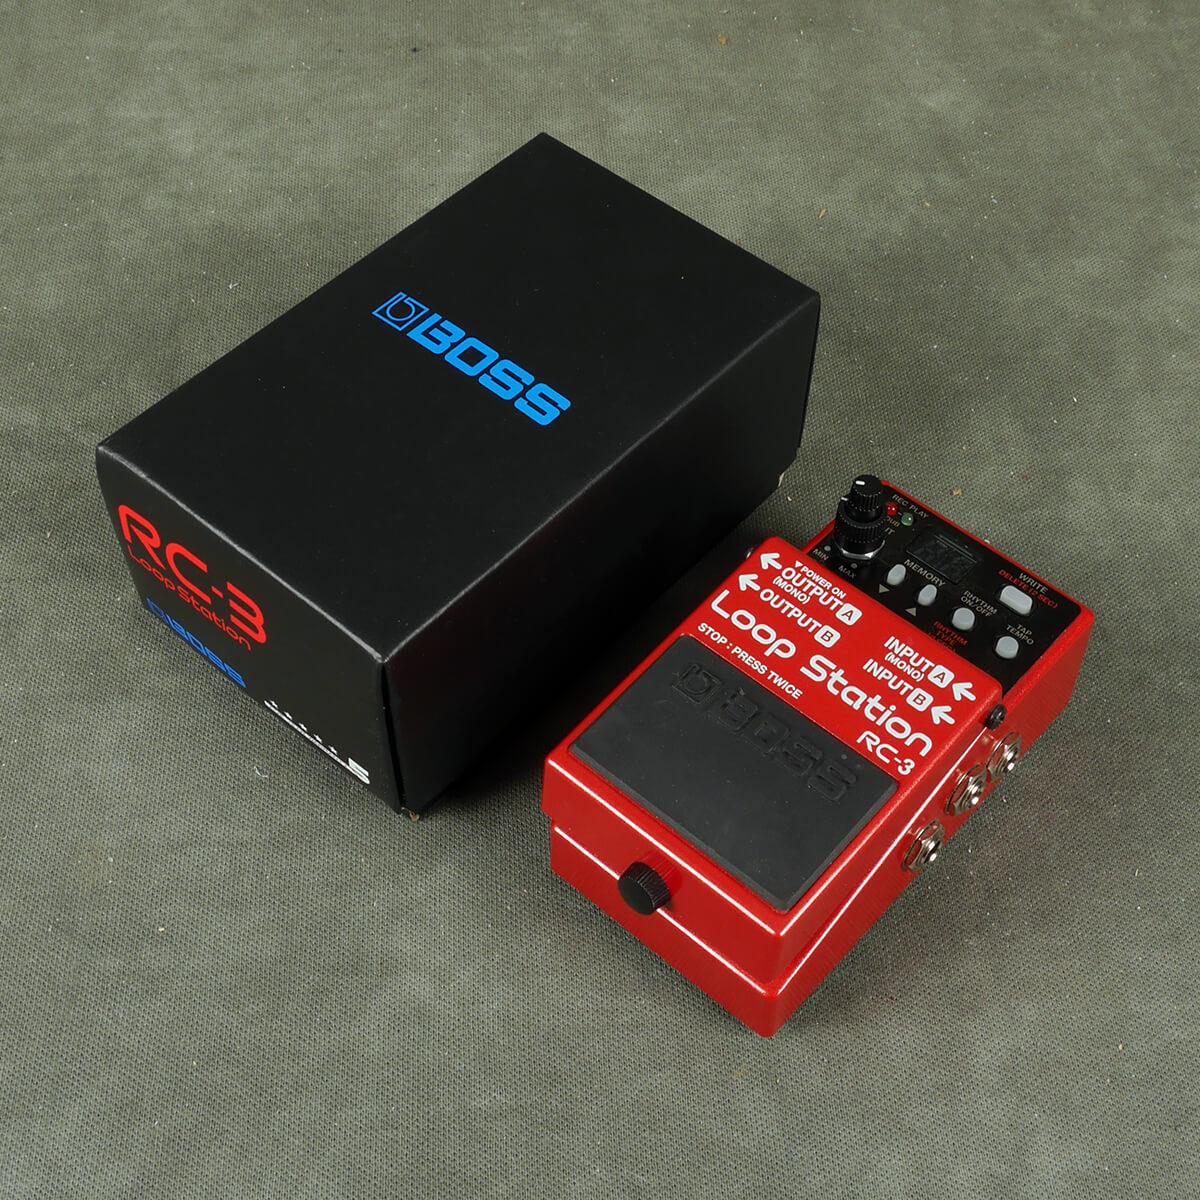 Boss RC-3 Loop Station Looper FX Pedal w/Box - 2nd Hand